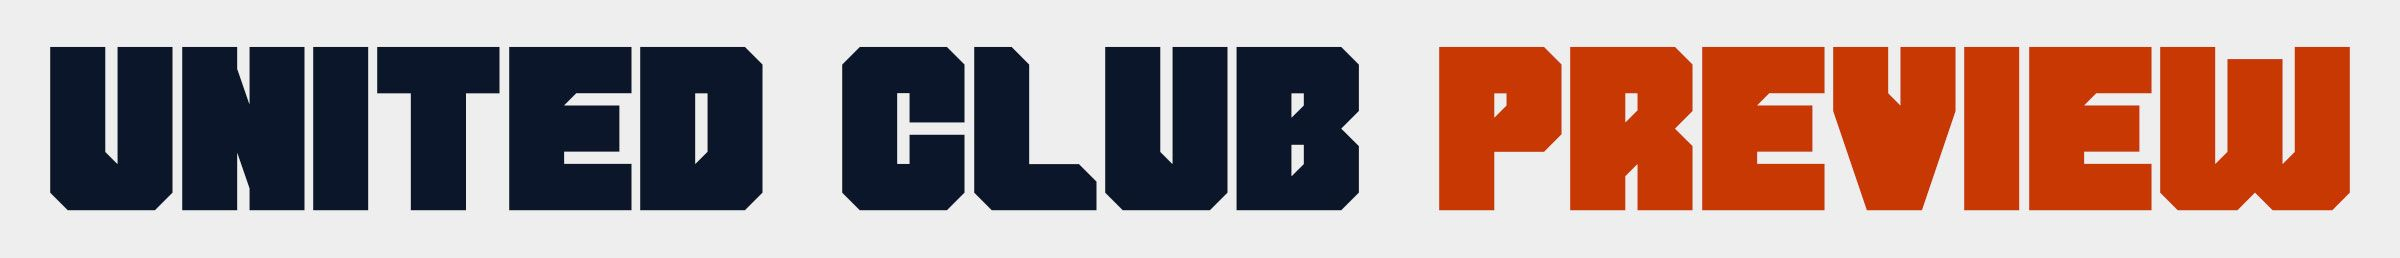 unitedclubpreview-header-080619